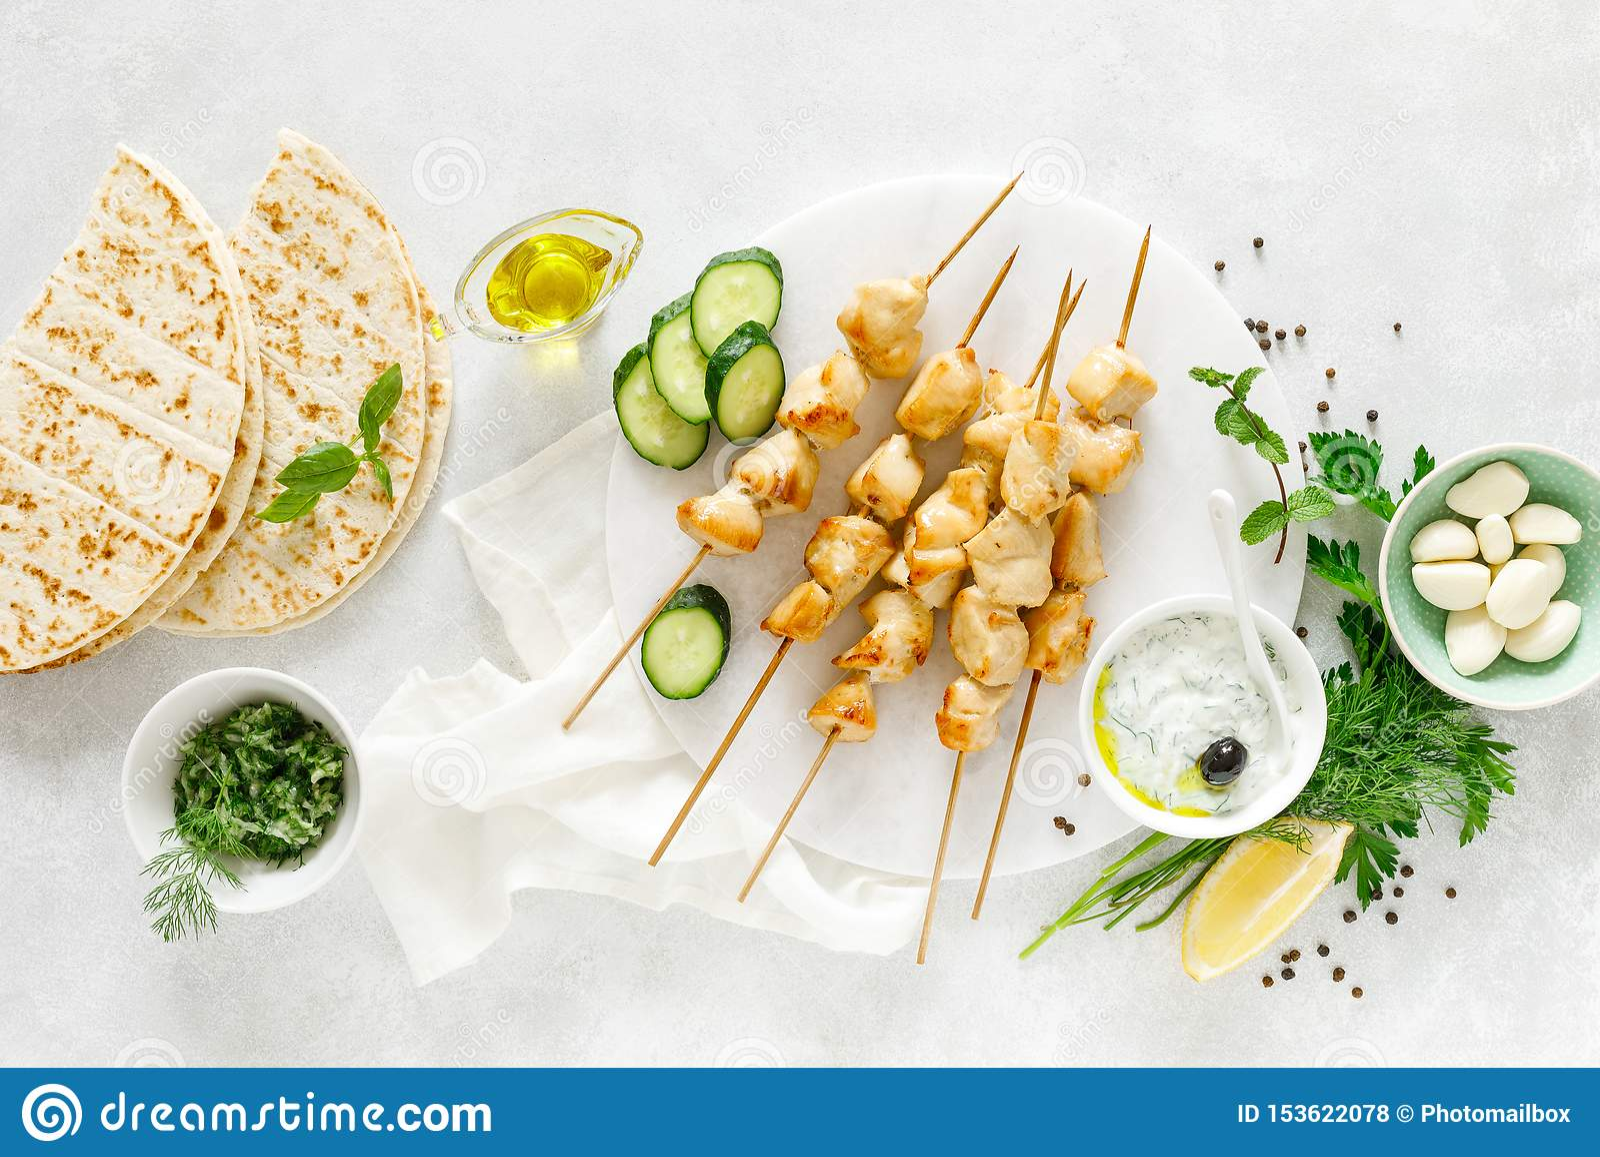 Grilled chicken kebab on skewers and traditional Greek tzatziki yogurt sauce